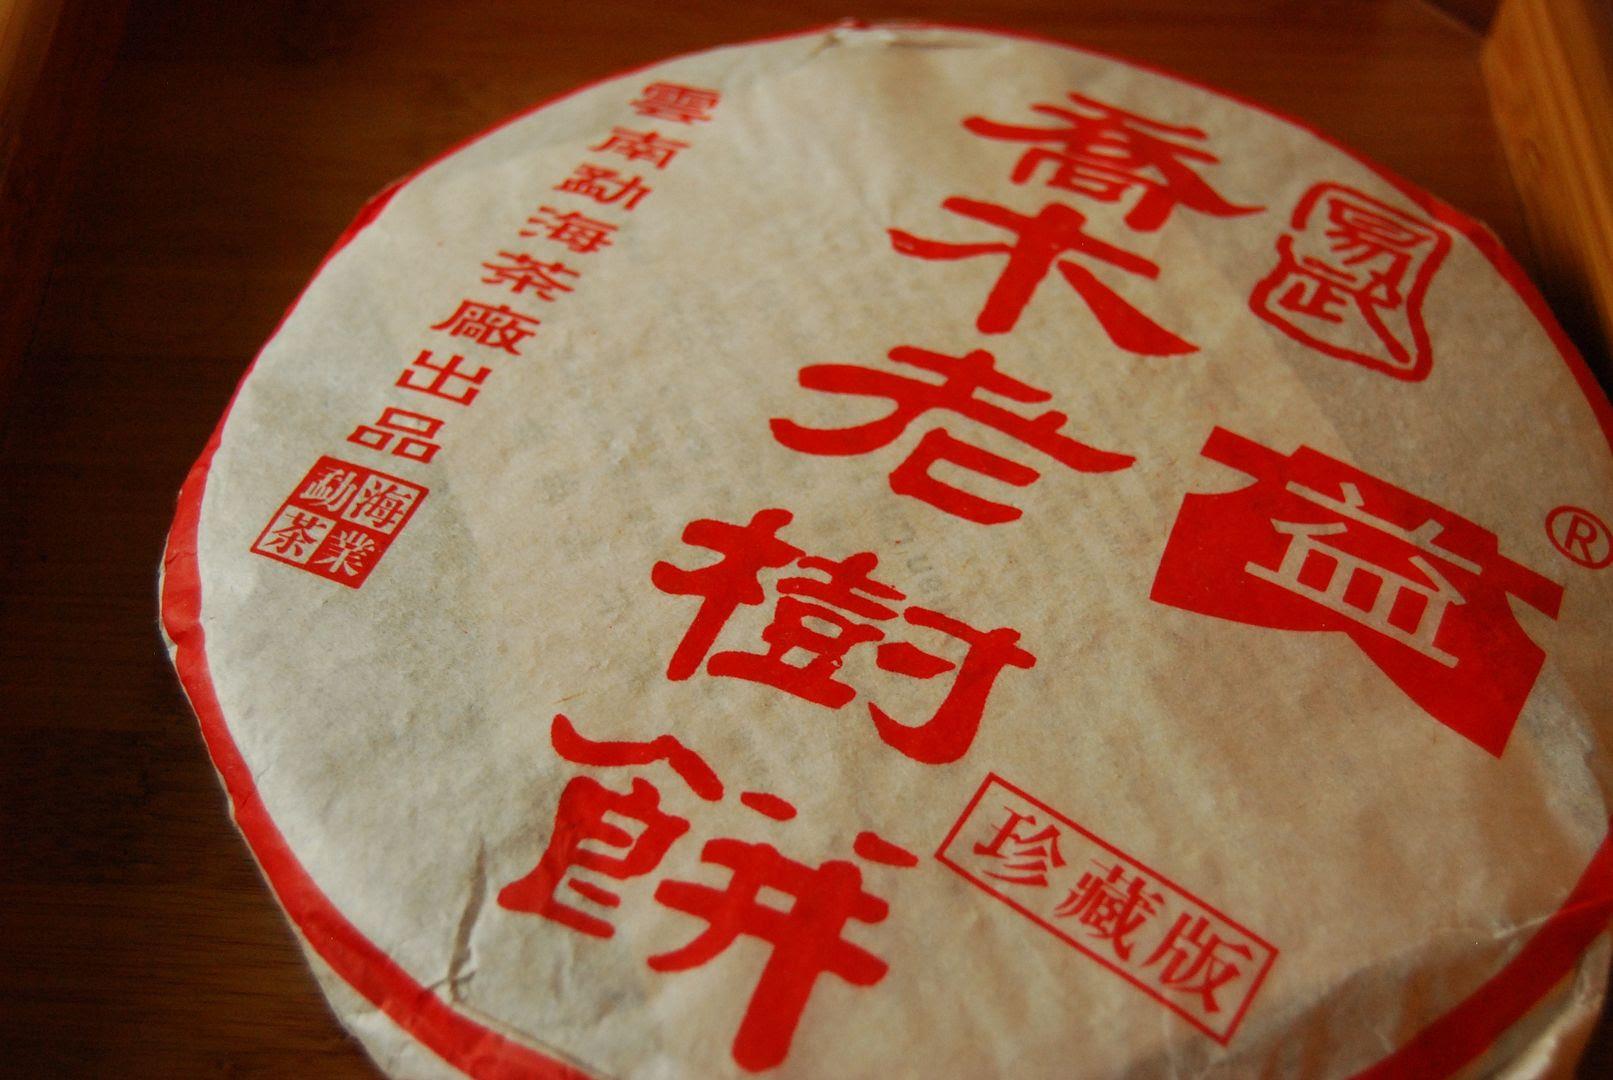 2003 Fake Dayi Qiaomu Laoshu